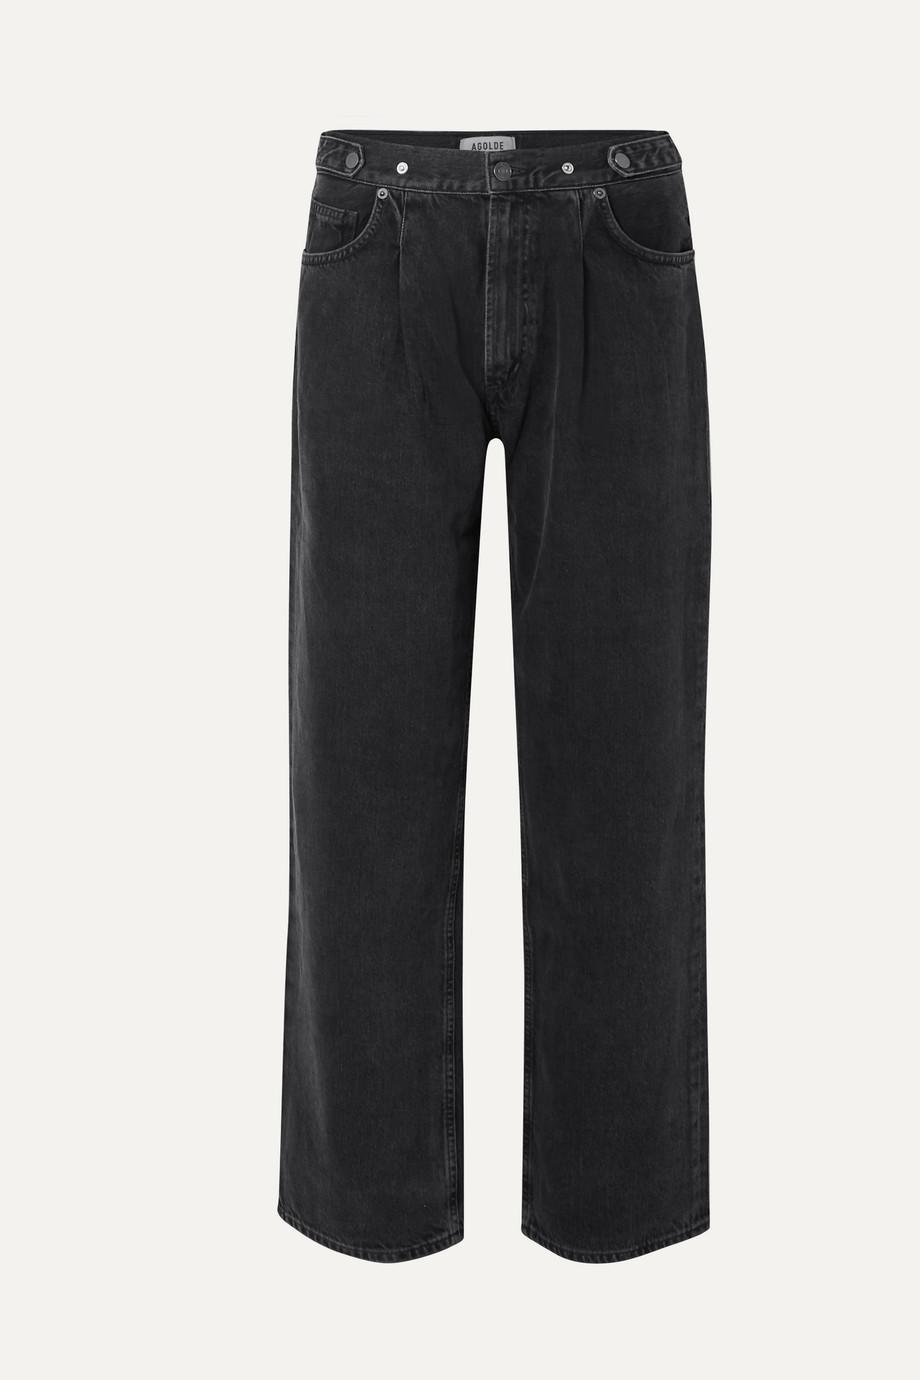 AGOLDE Mid-rise boyfriend jeans